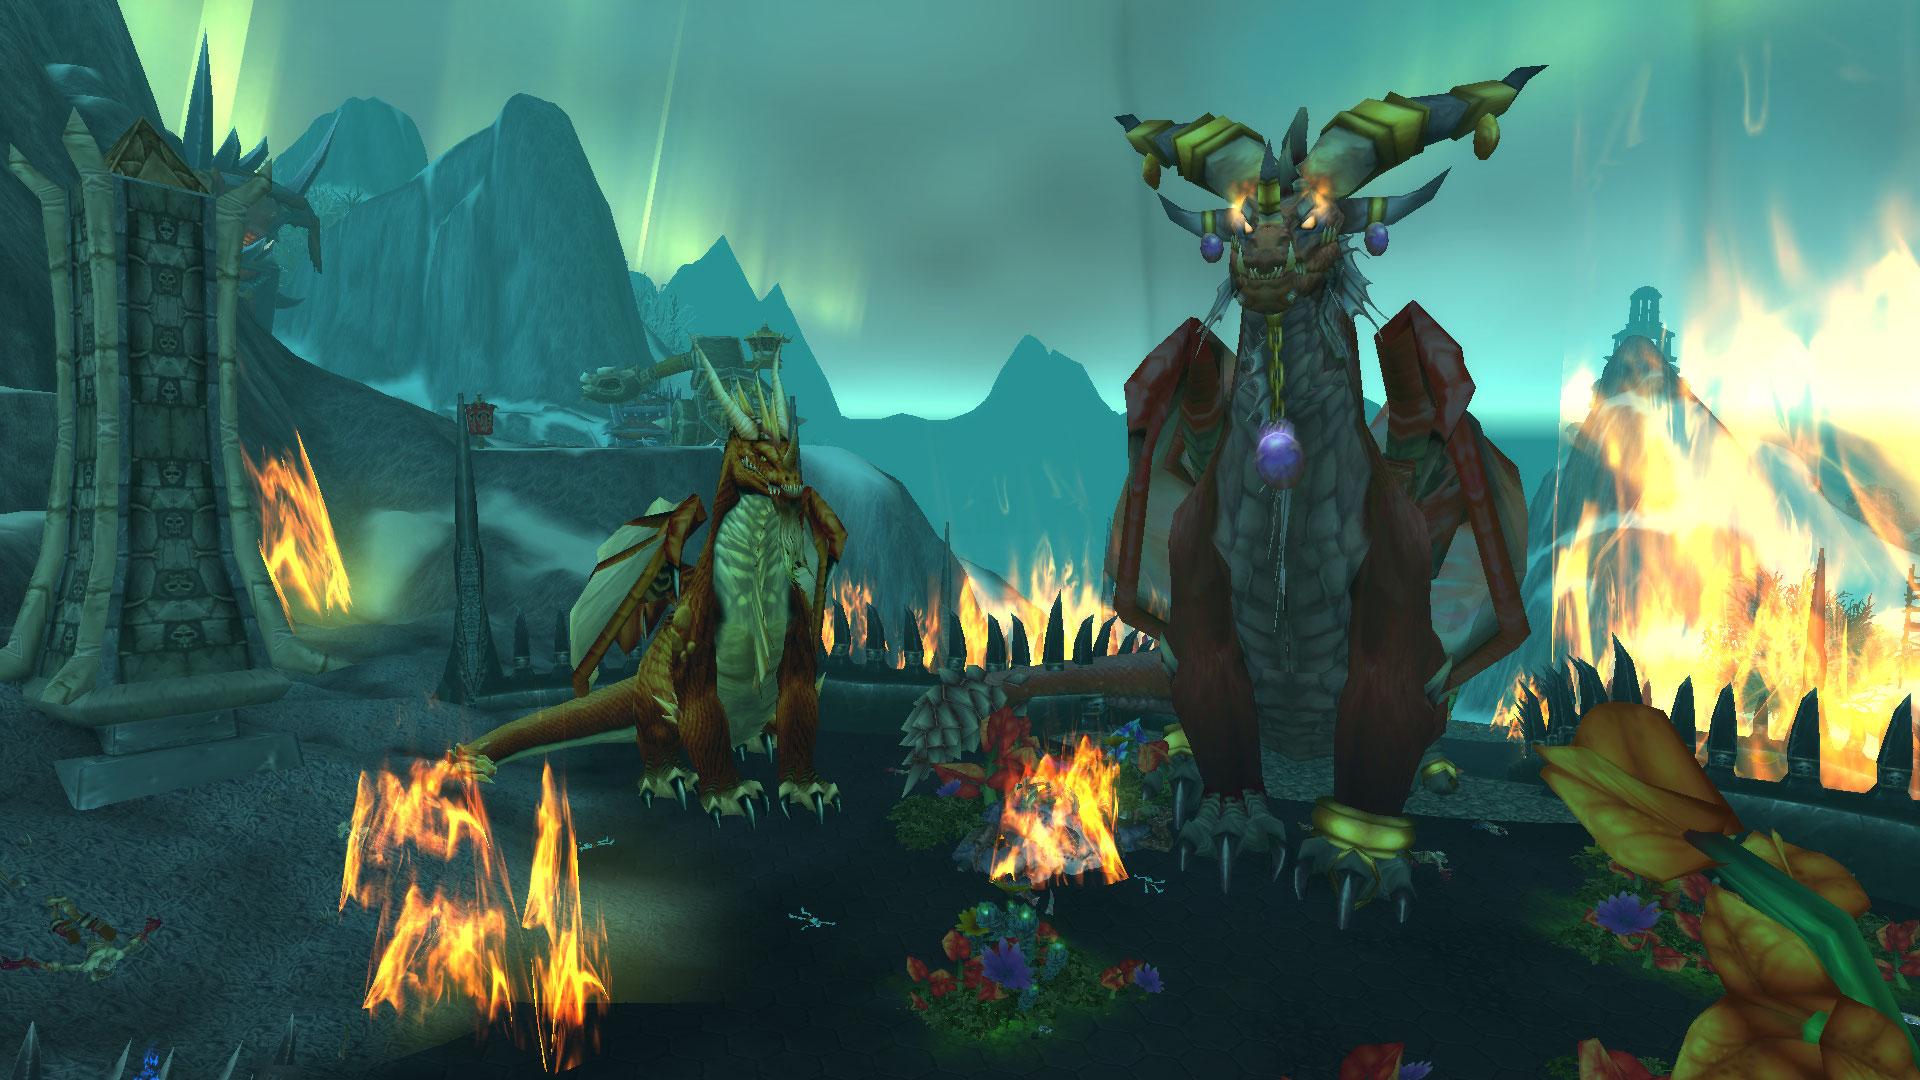 World of Warcraft Dragon Lore Krasus and Alexstrasza 2